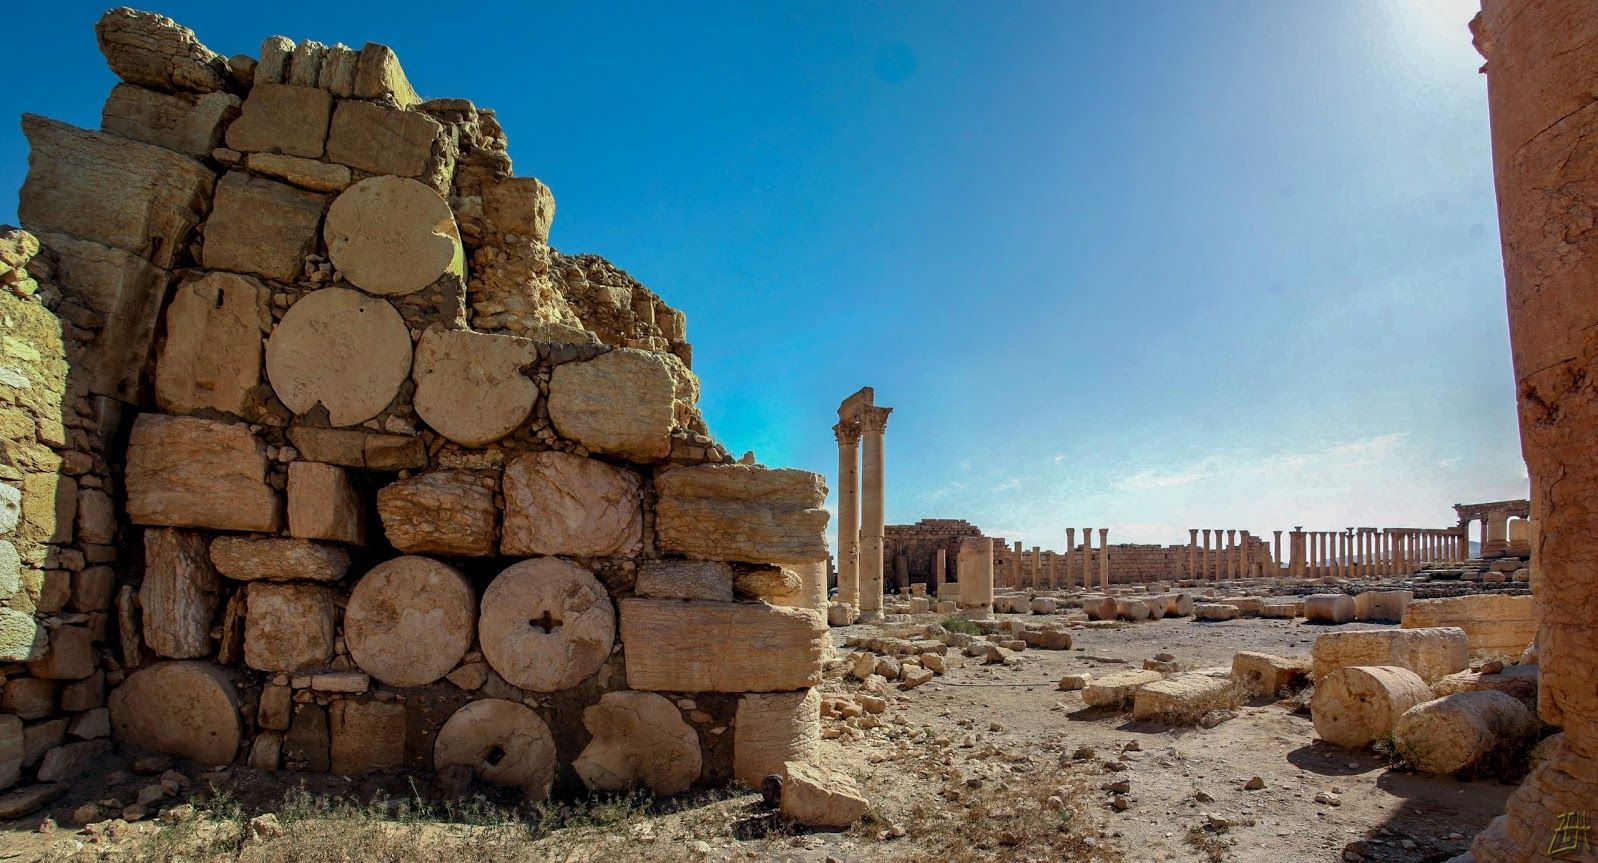 #Palmyra #Syria (photo by Zaid El-Hoiydi)